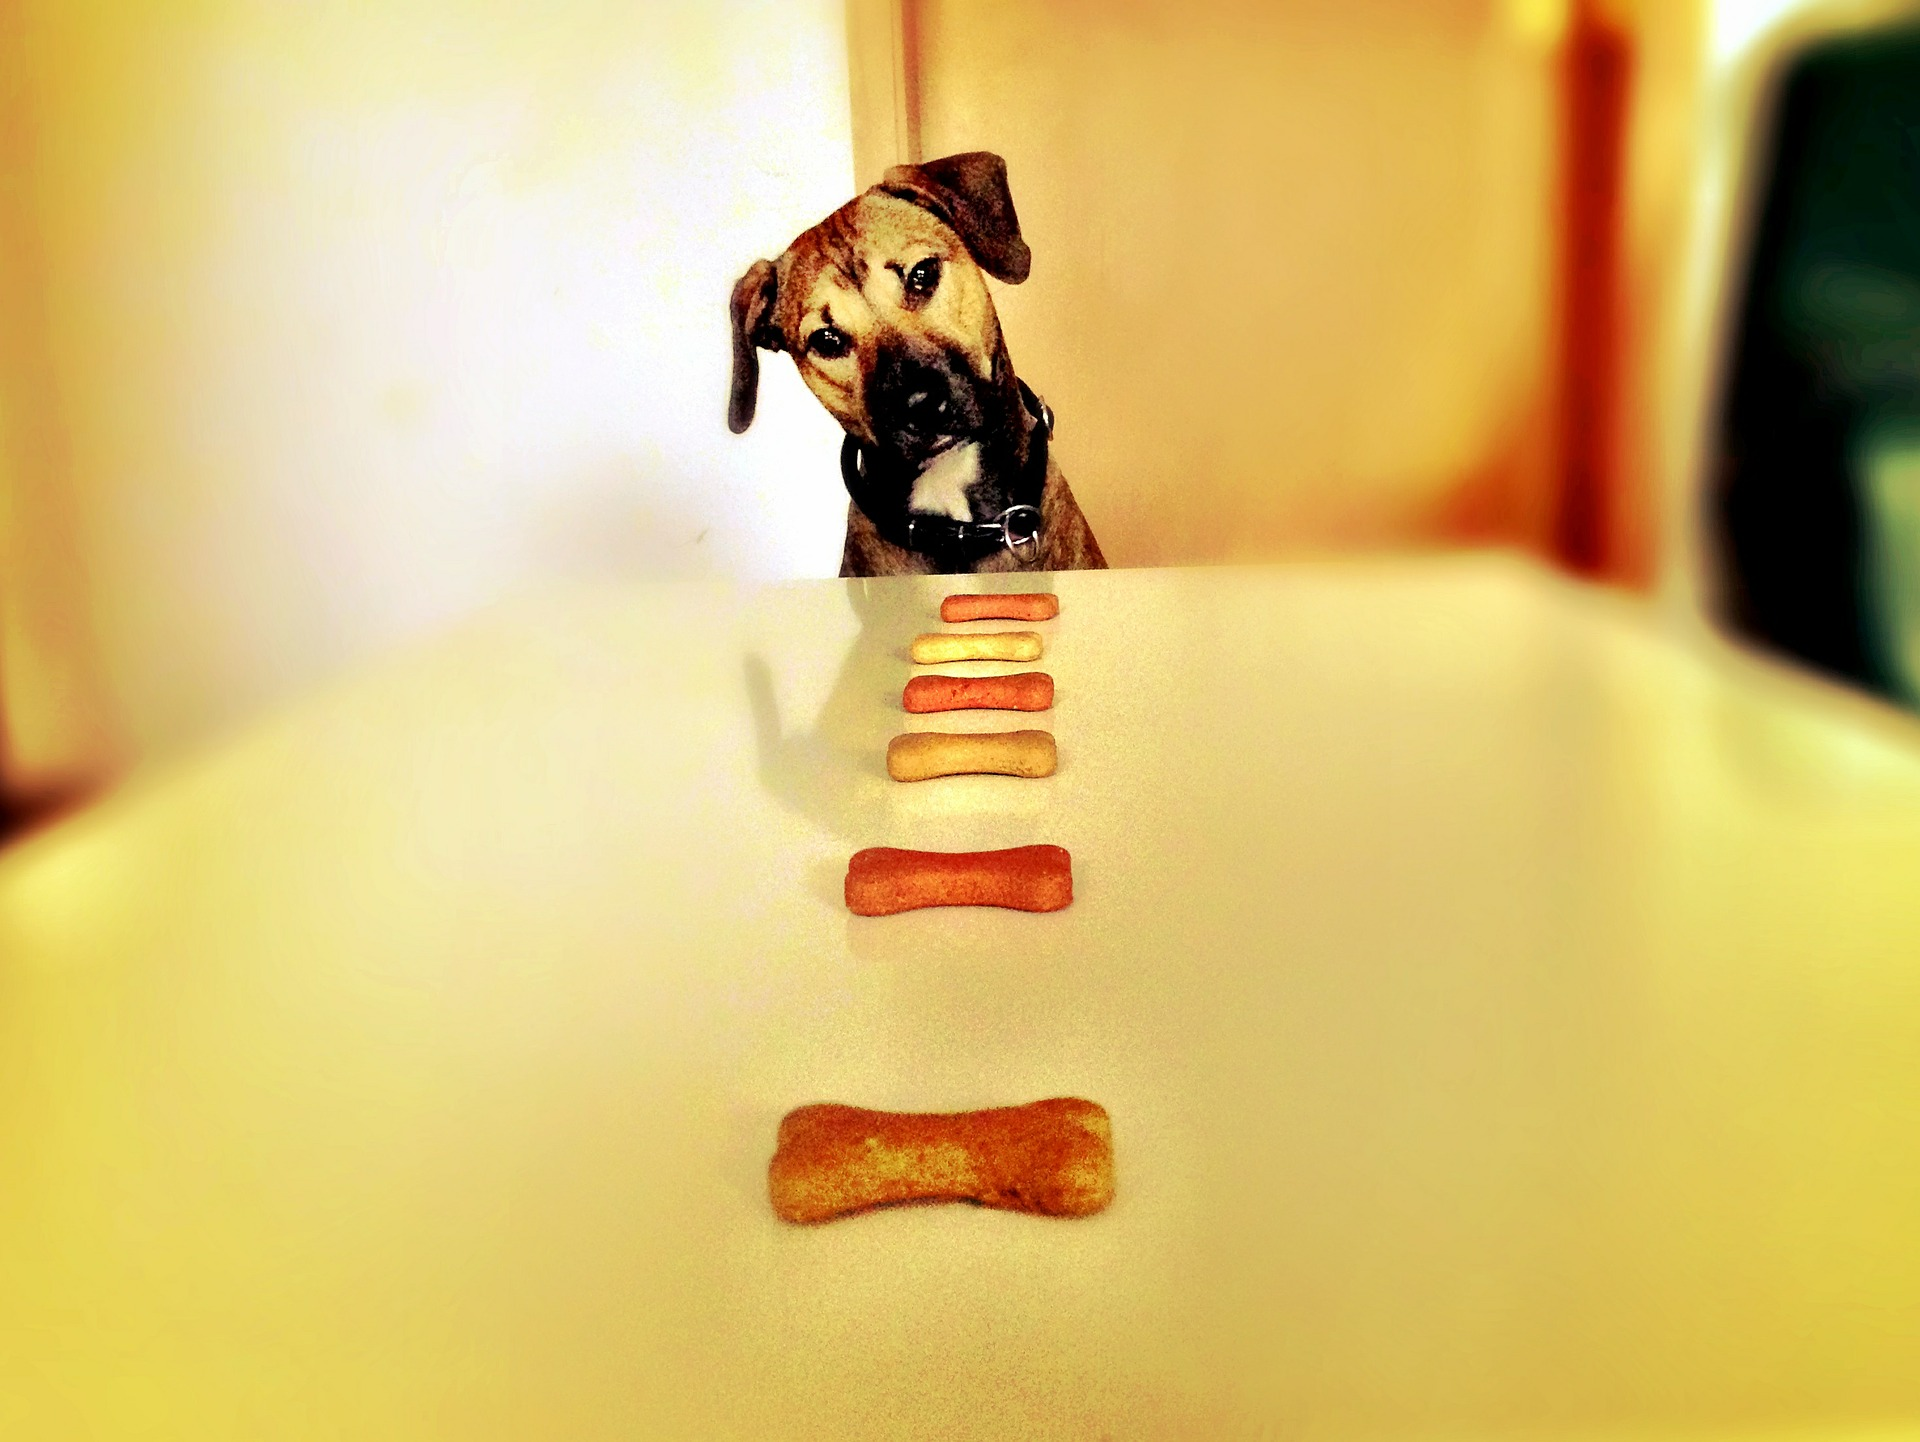 Dog looks at a line of bone-shaped dog treats